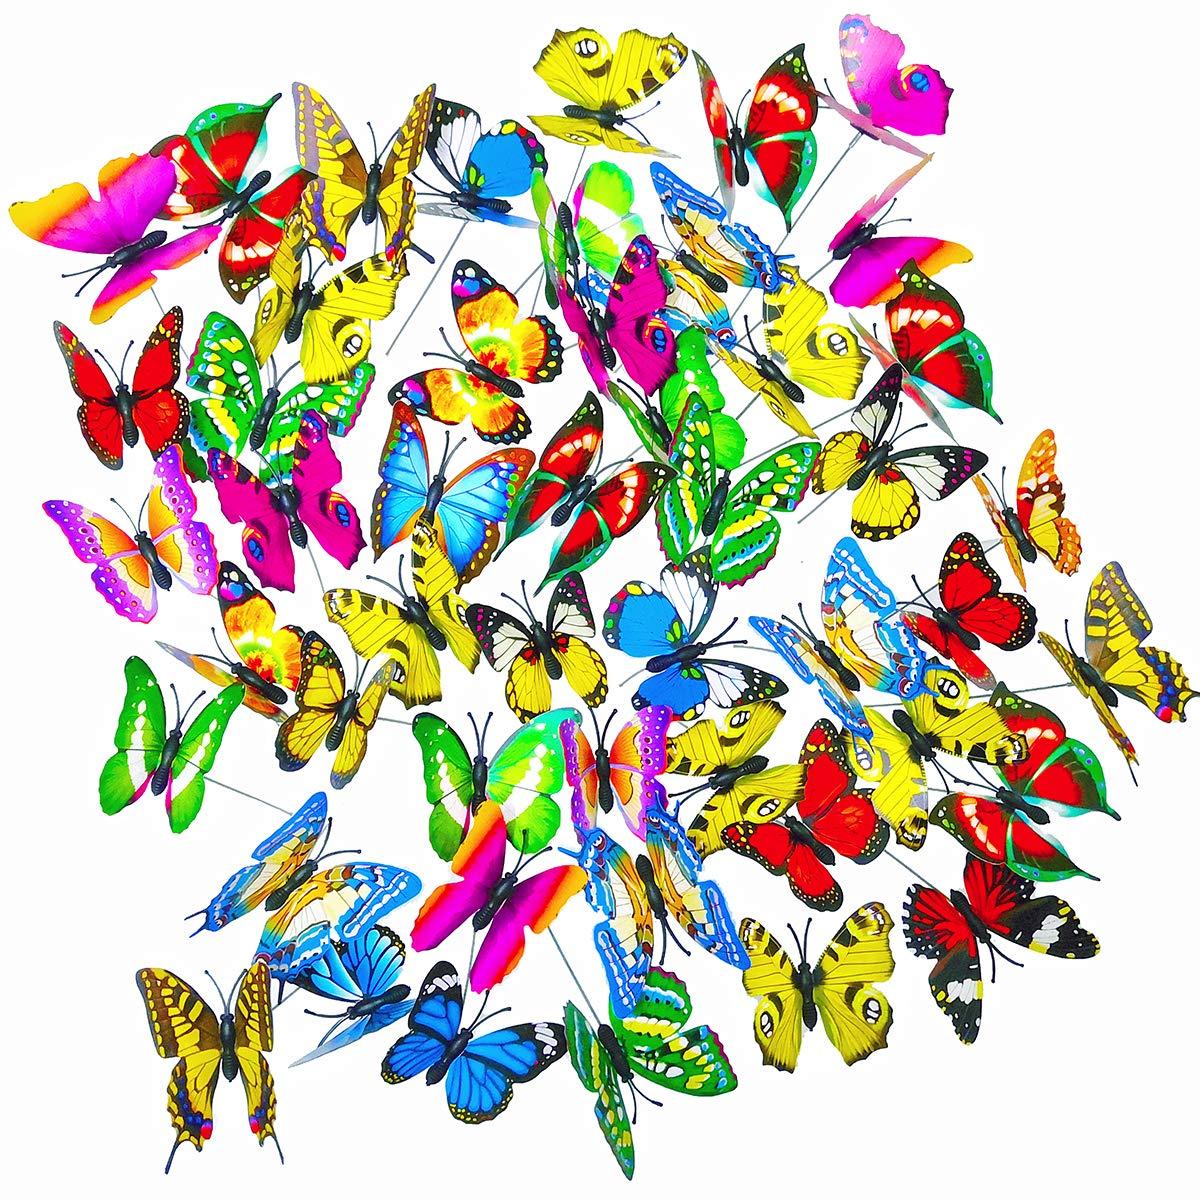 Antallcky 50pcs Butterfly Stakes Outdoor Yard Planter Flower Pot Bed Garden Decor Butterflies Christmas Decorations,Butterflies on Metal Wire Plant Stake,Fairy Garden Accessories Gardening Gifts